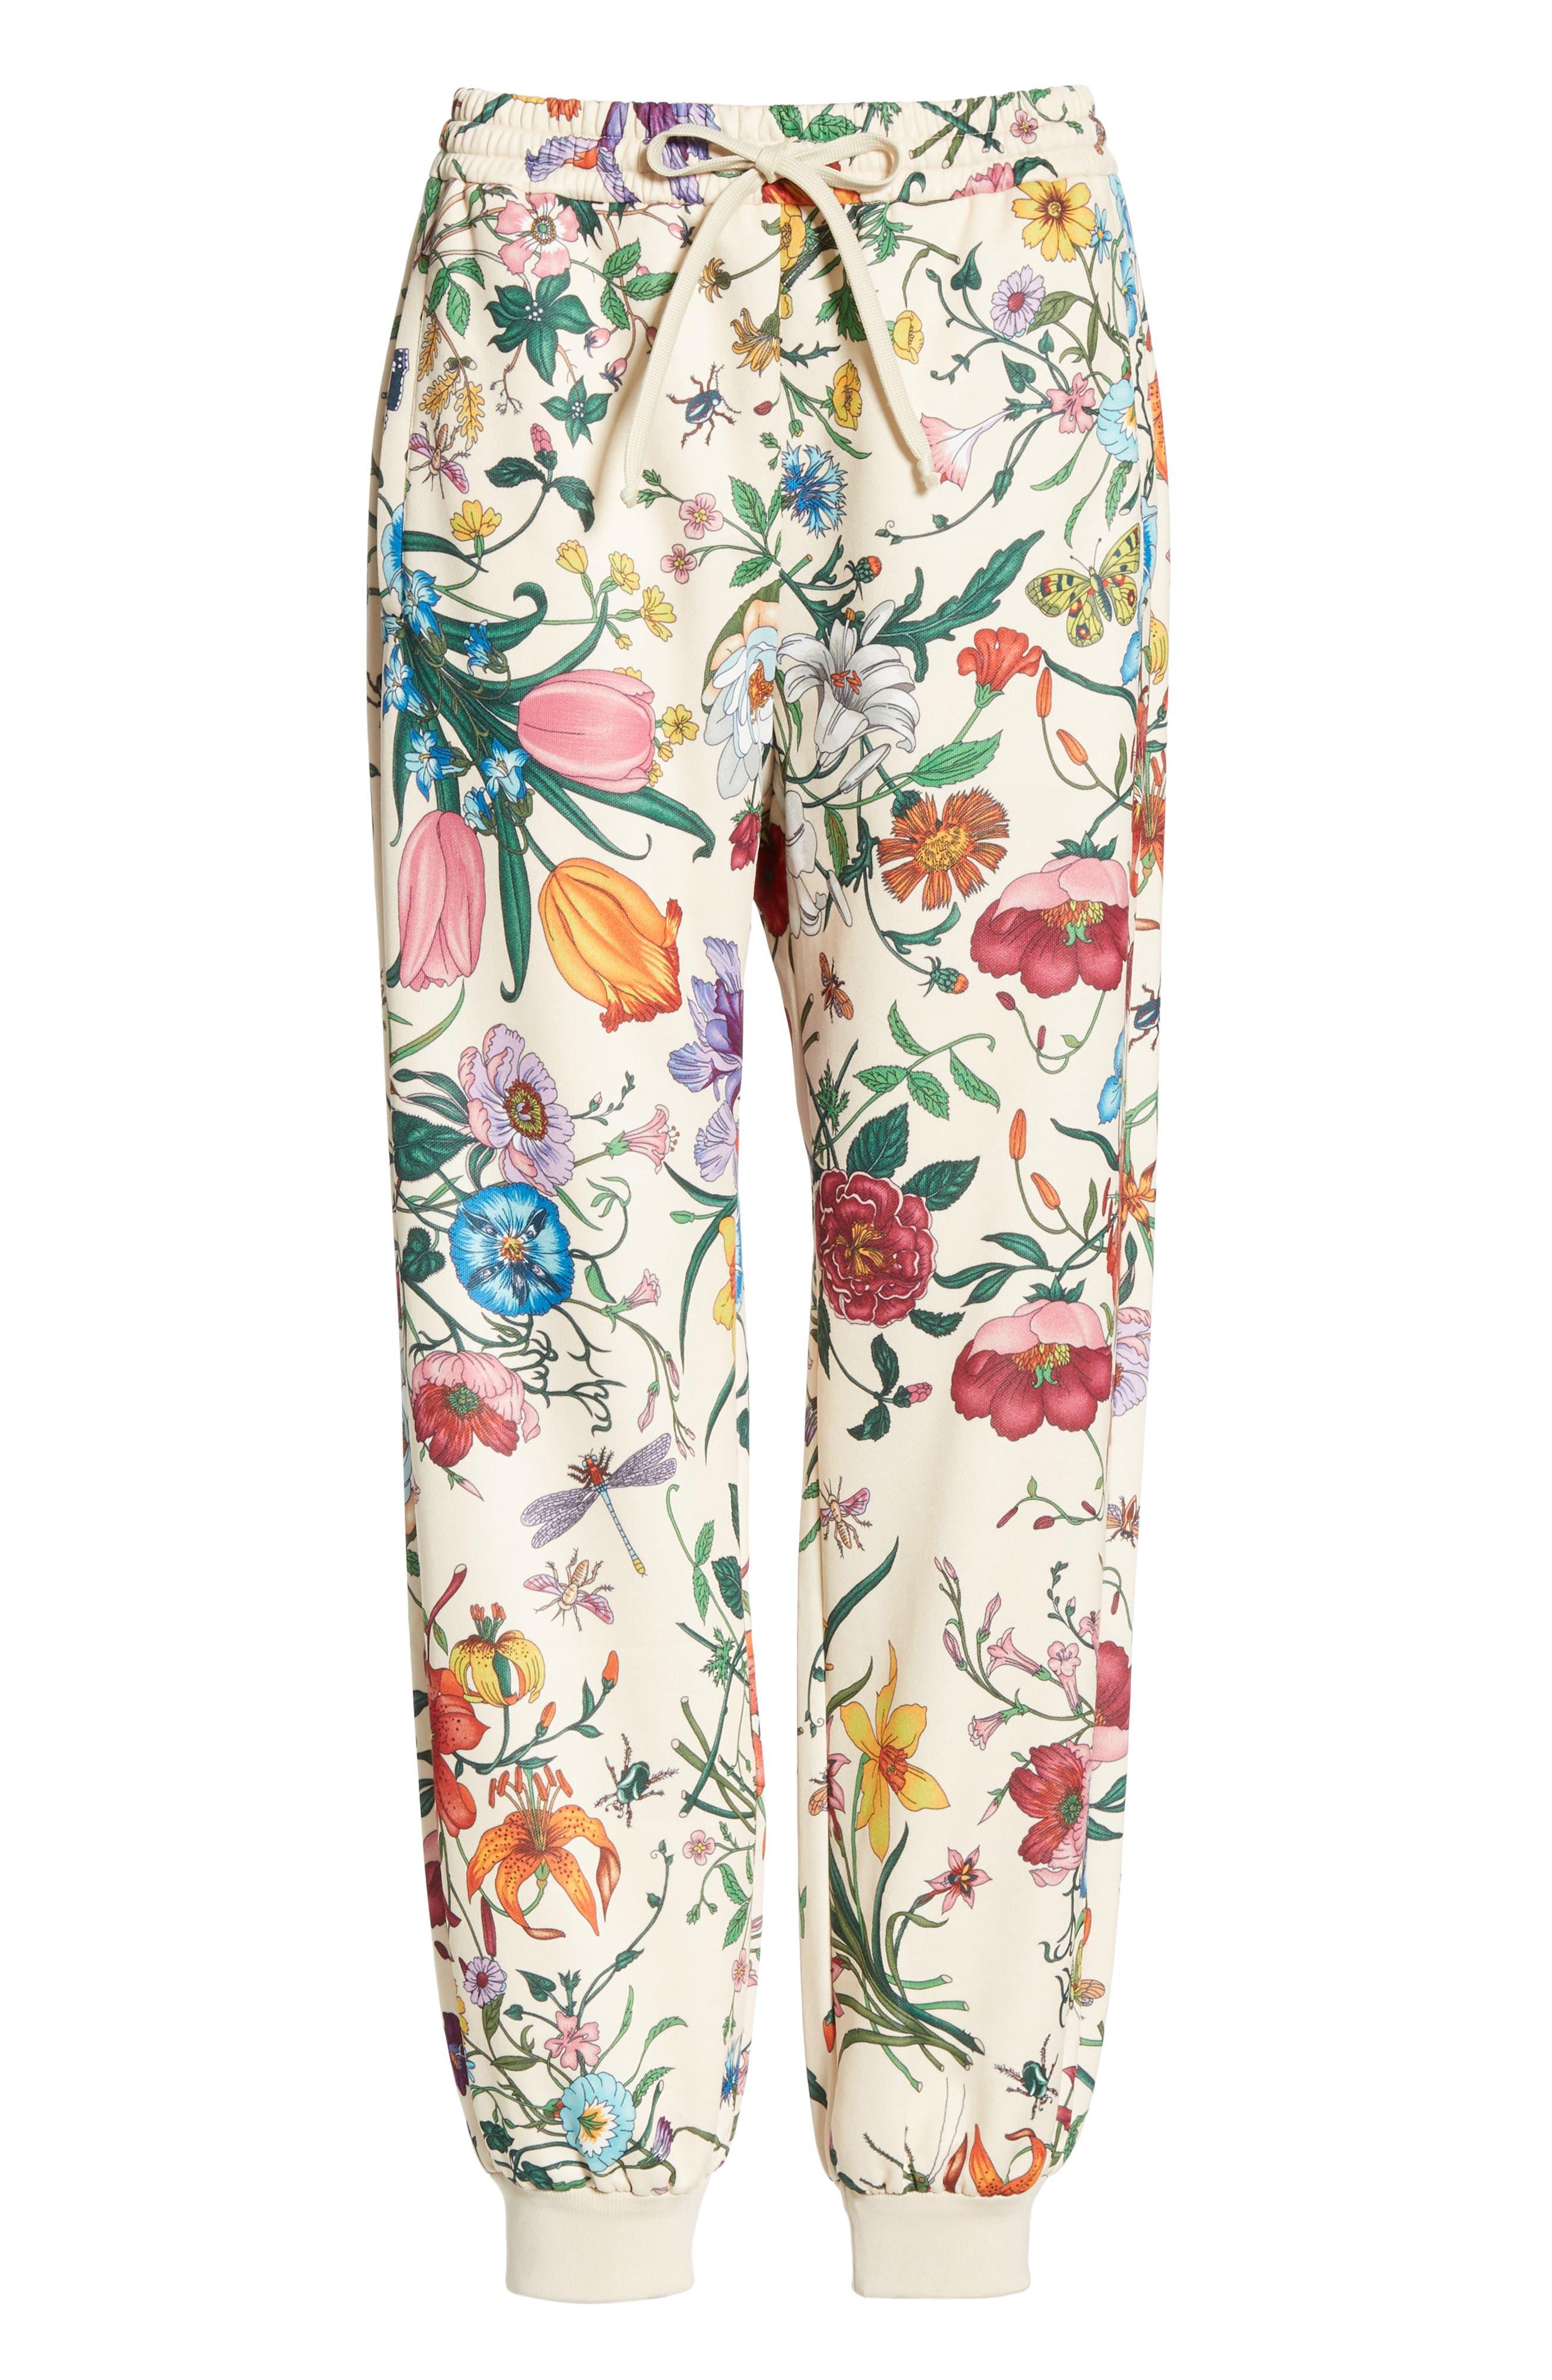 Floral Print Tech Jersey Track Pants,                             Alternate thumbnail 3, color,                             9381 IVORY/ MULTICOLOR